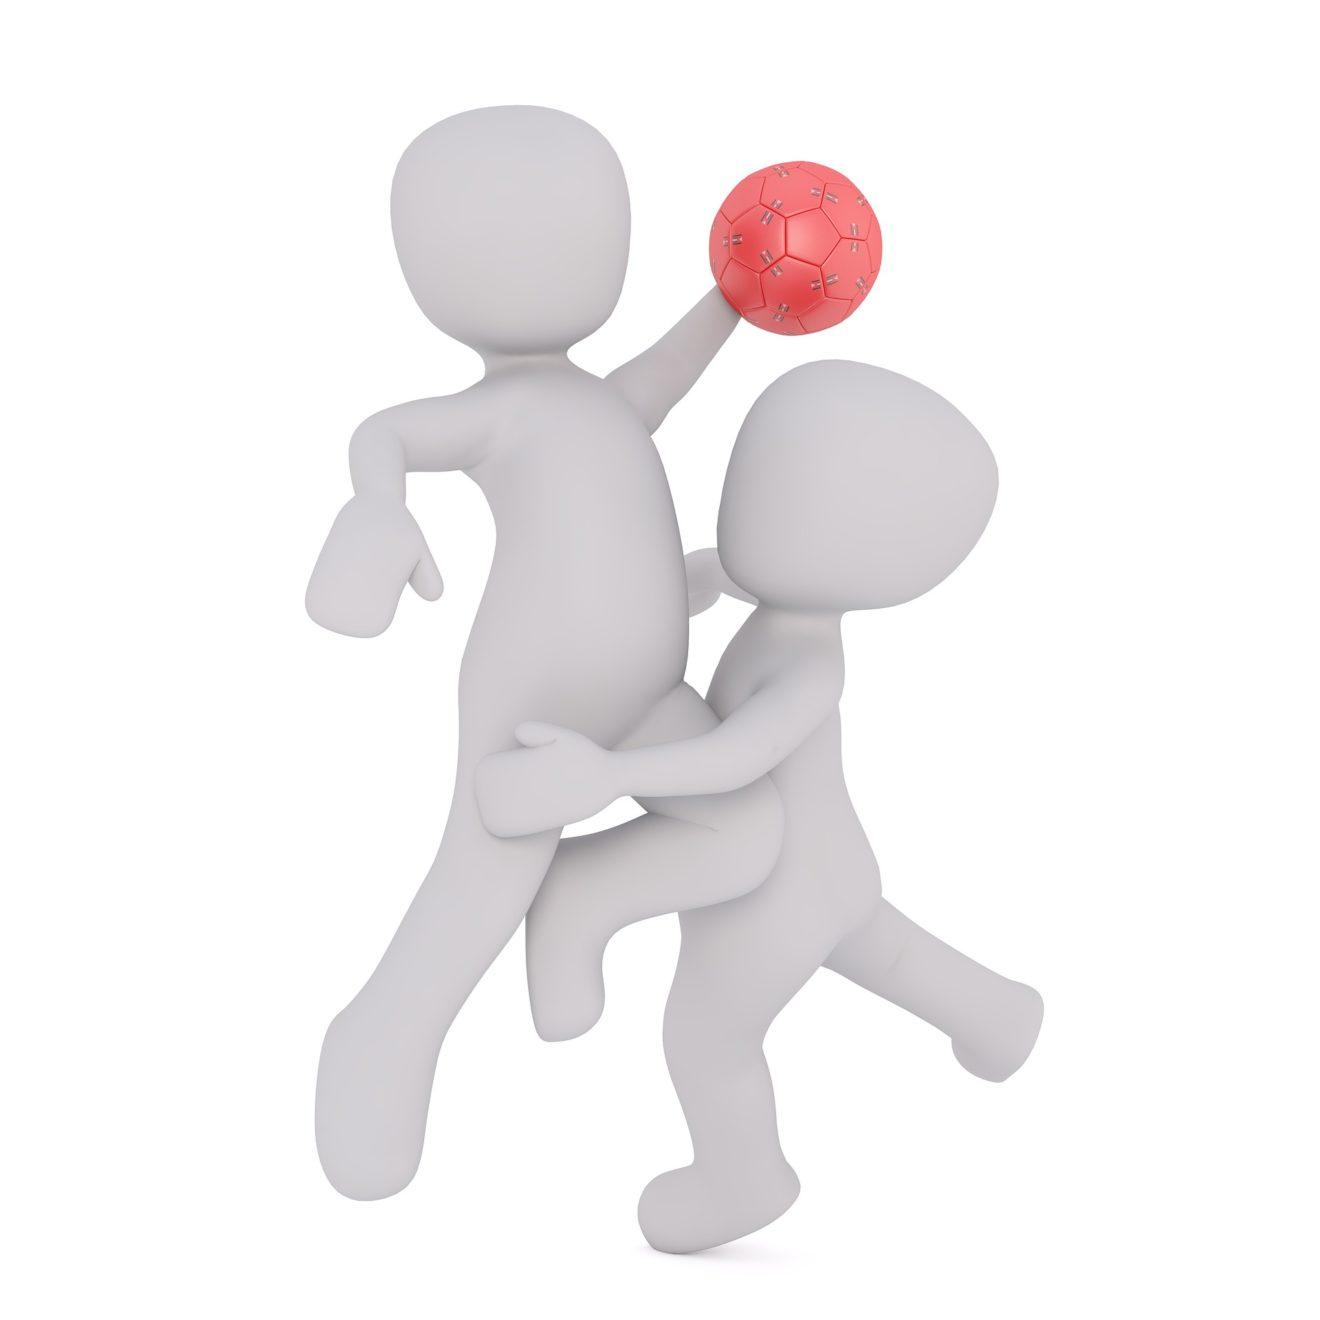 Wiederaufnahme Kinderhandball-Spielbetrieb